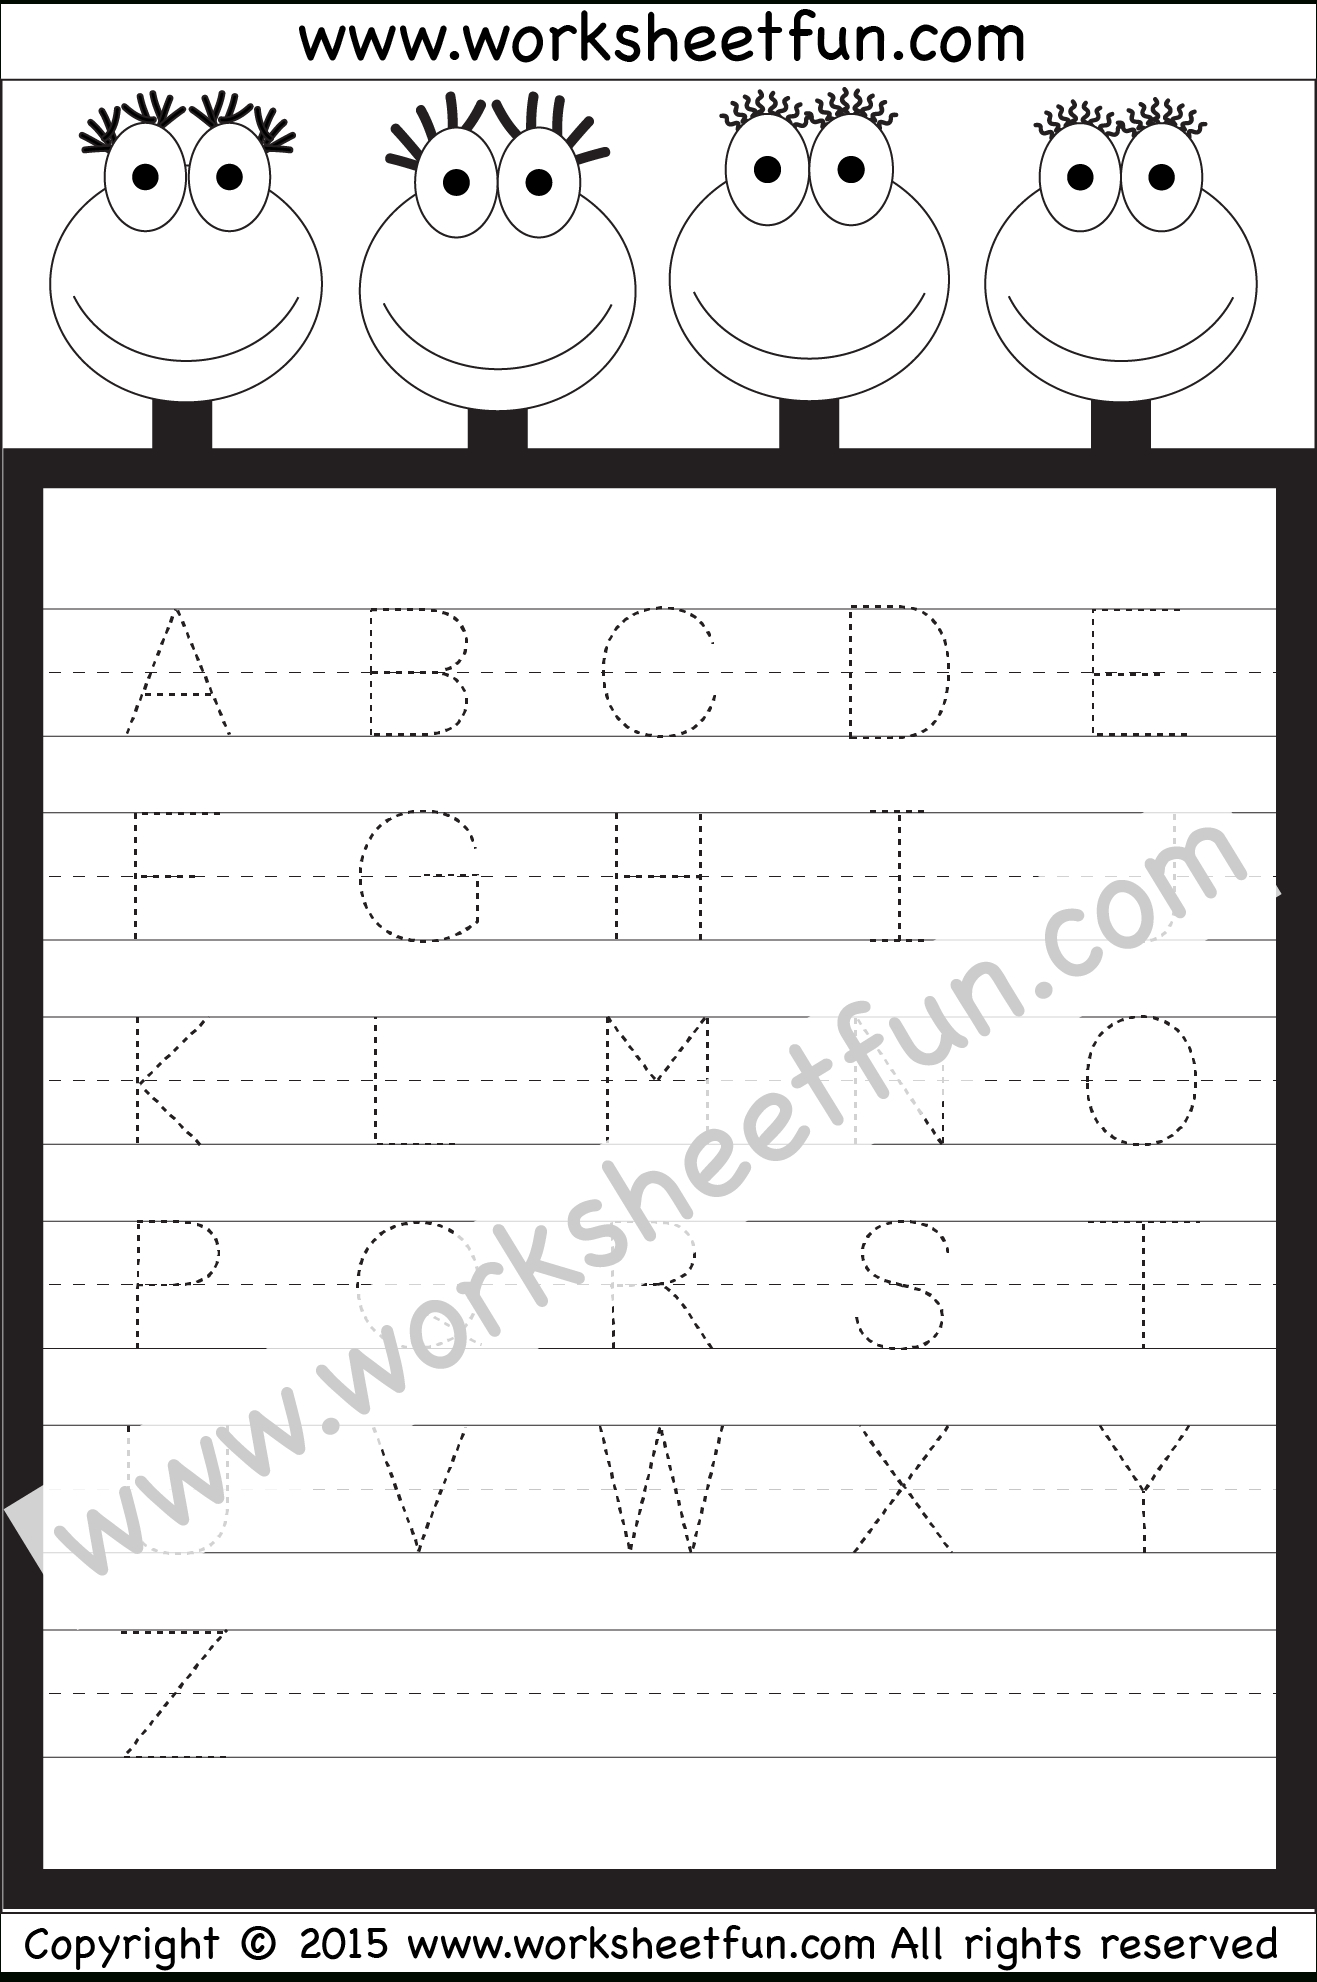 Letter Tracing Worksheet – Capital Letters / Free Printable - Free Printable Alphabet Tracing Worksheets For Kindergarten